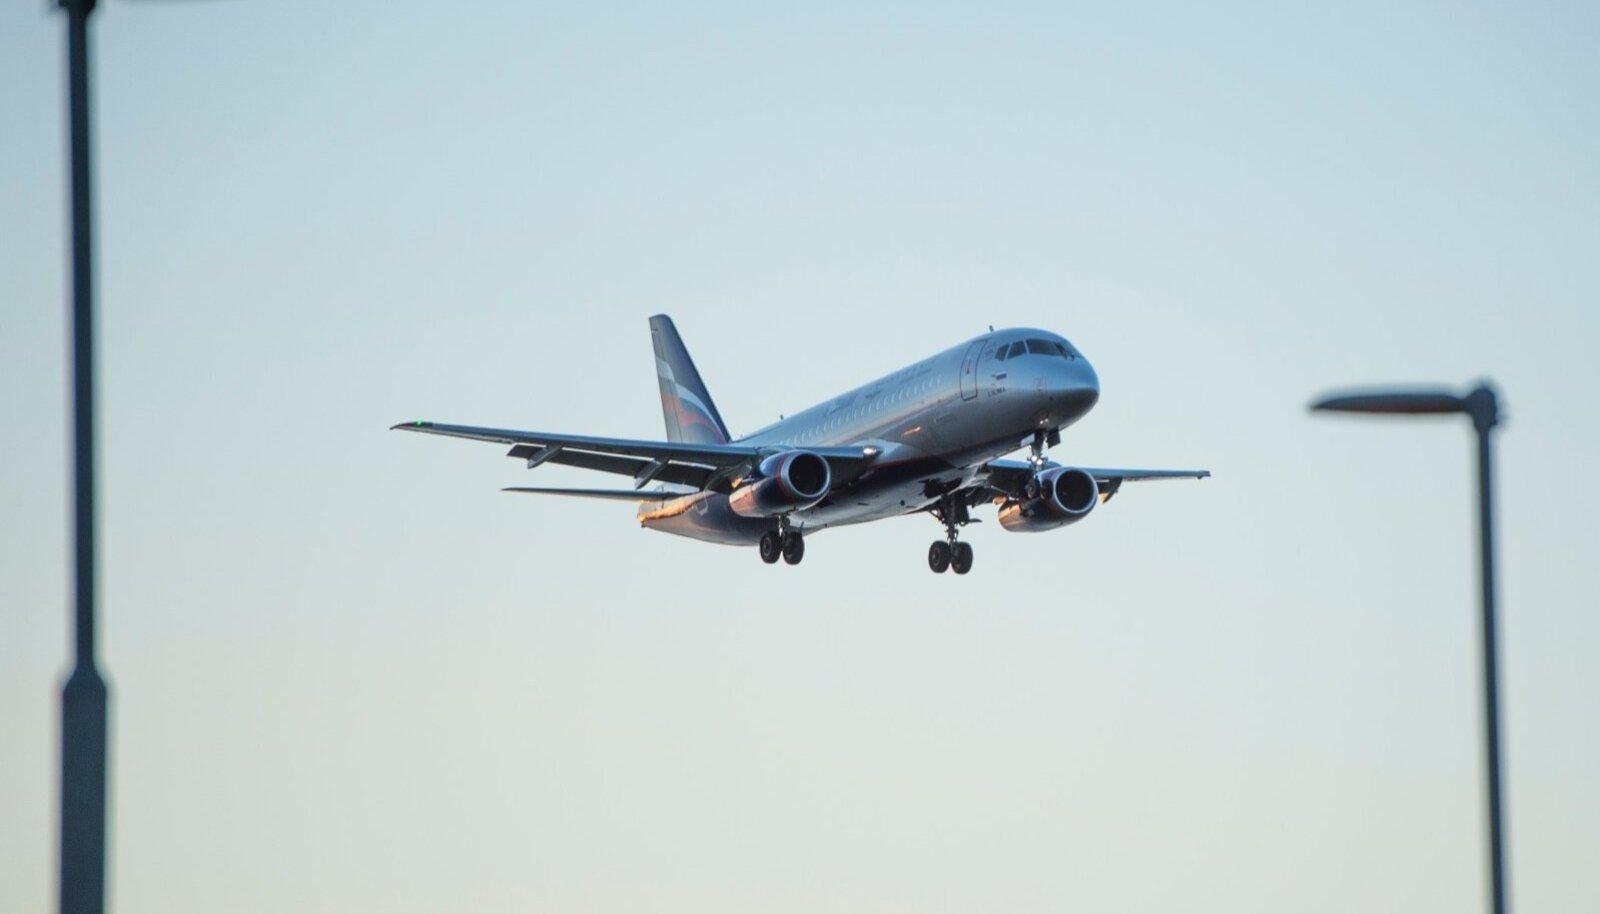 Aerofloti lennuk maandumas.